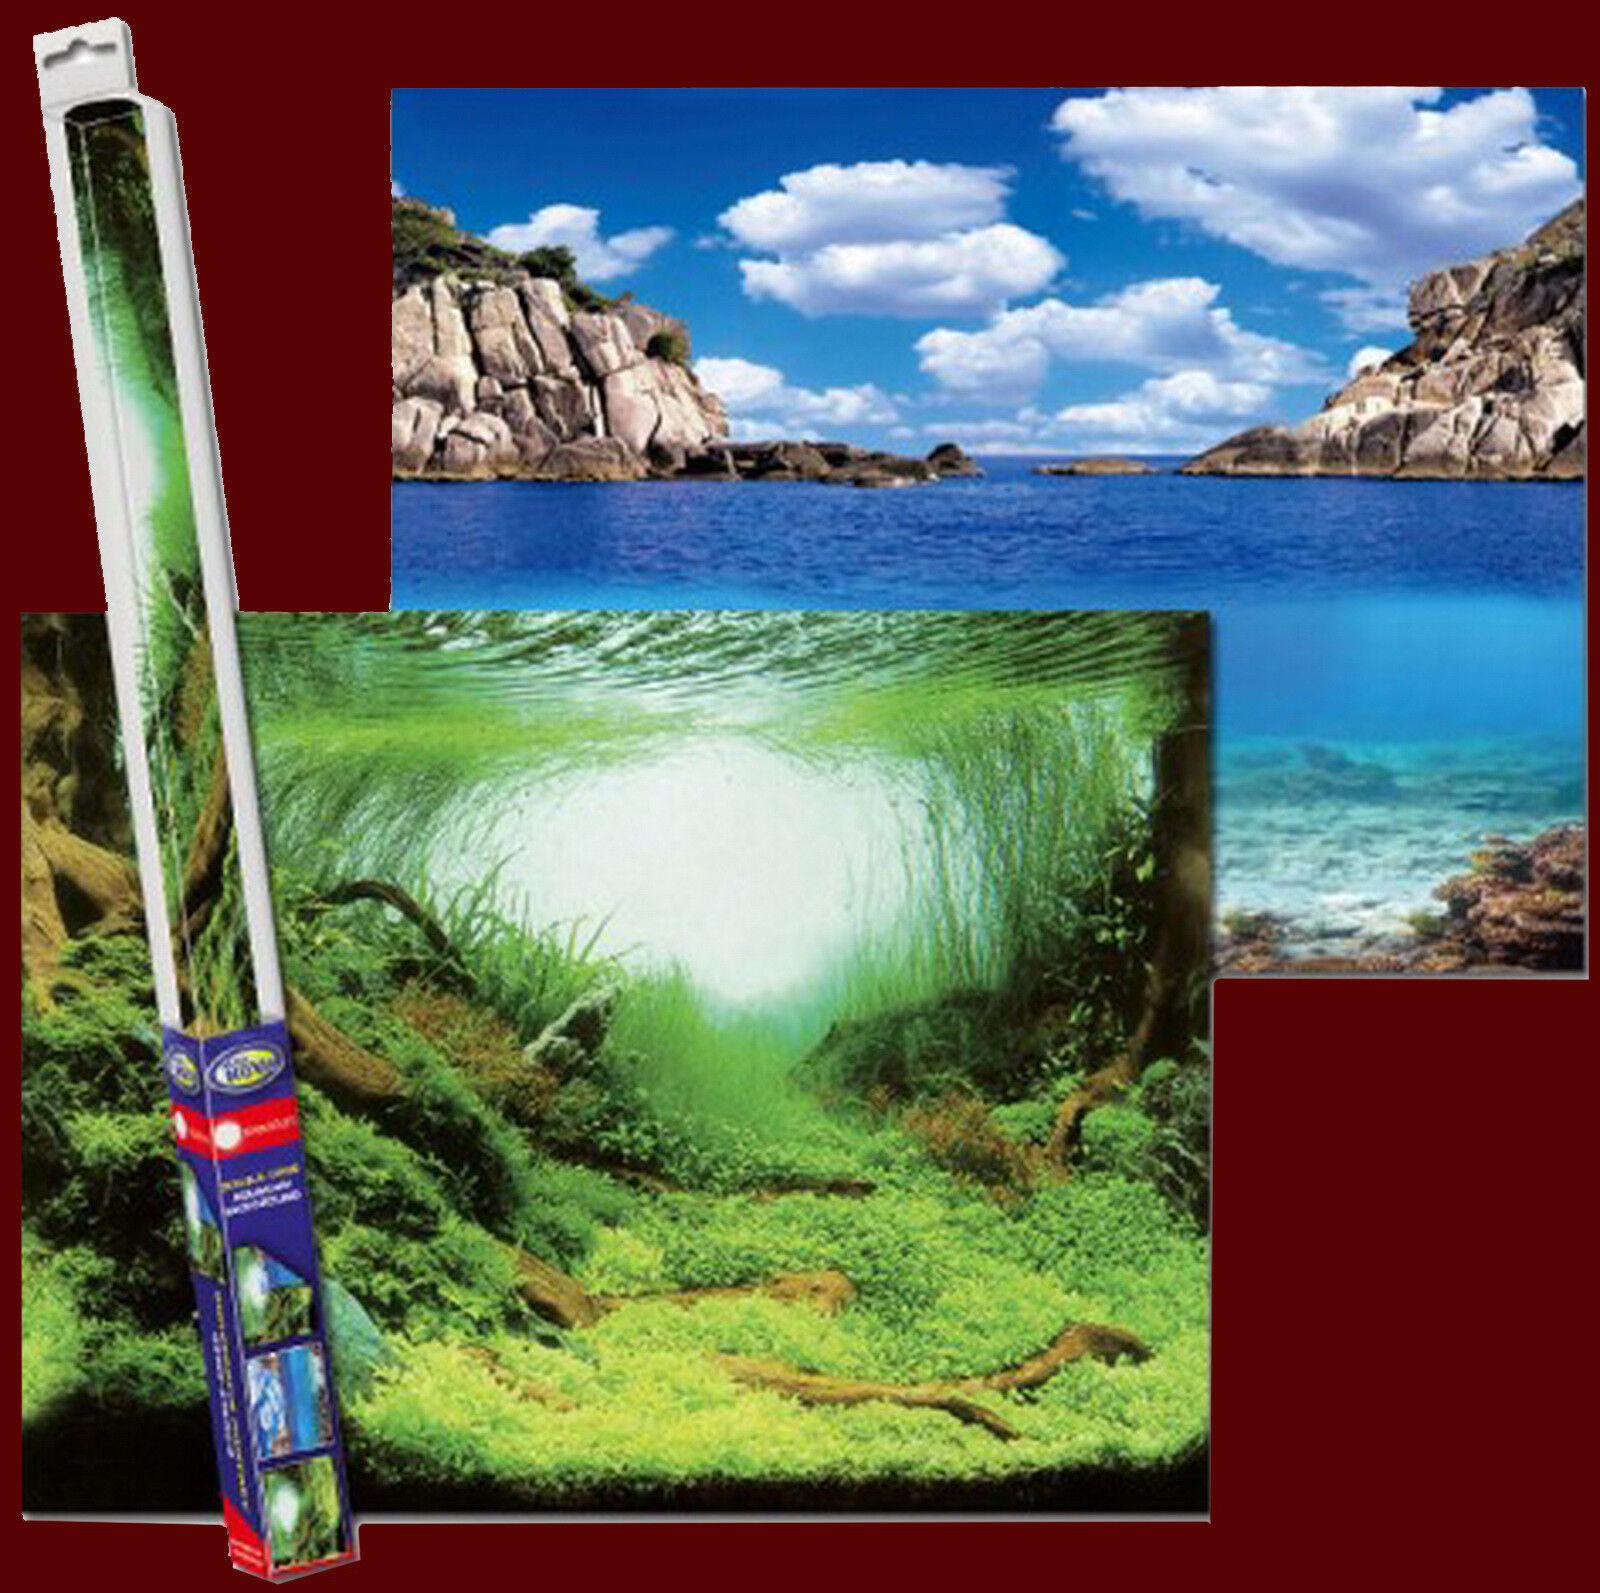 Aquarium Deko ❤️ RÜCKWANDFOLIE 60 X 30cm ❤️ Fotorückwand Zubehör Dekoration